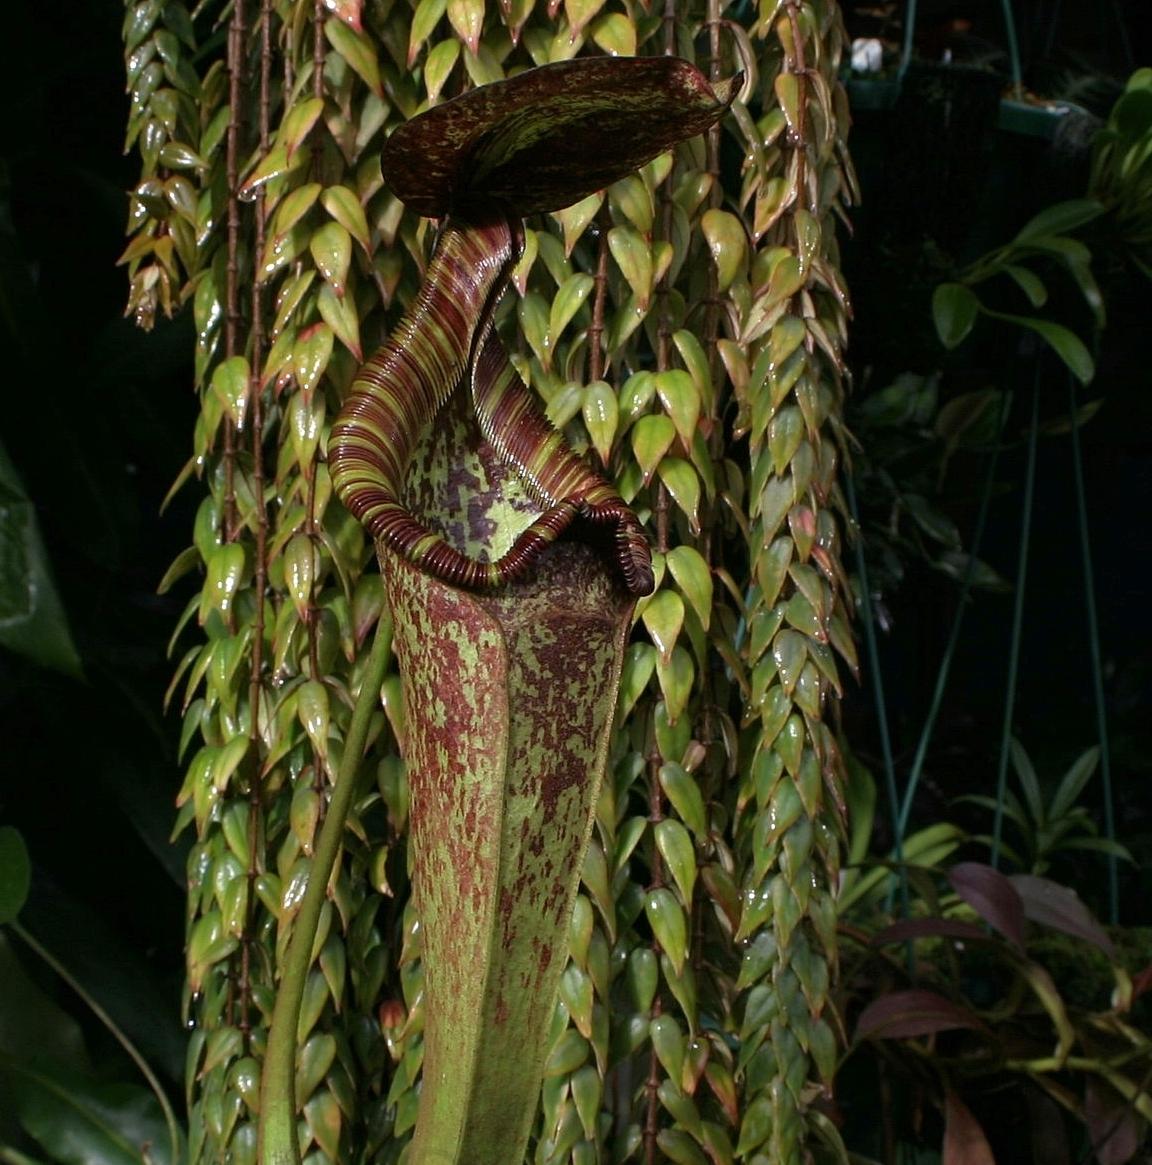 Nepenthes rafflesiana  'Kondo' upper pitchers and  Columnea arguta  August 2007